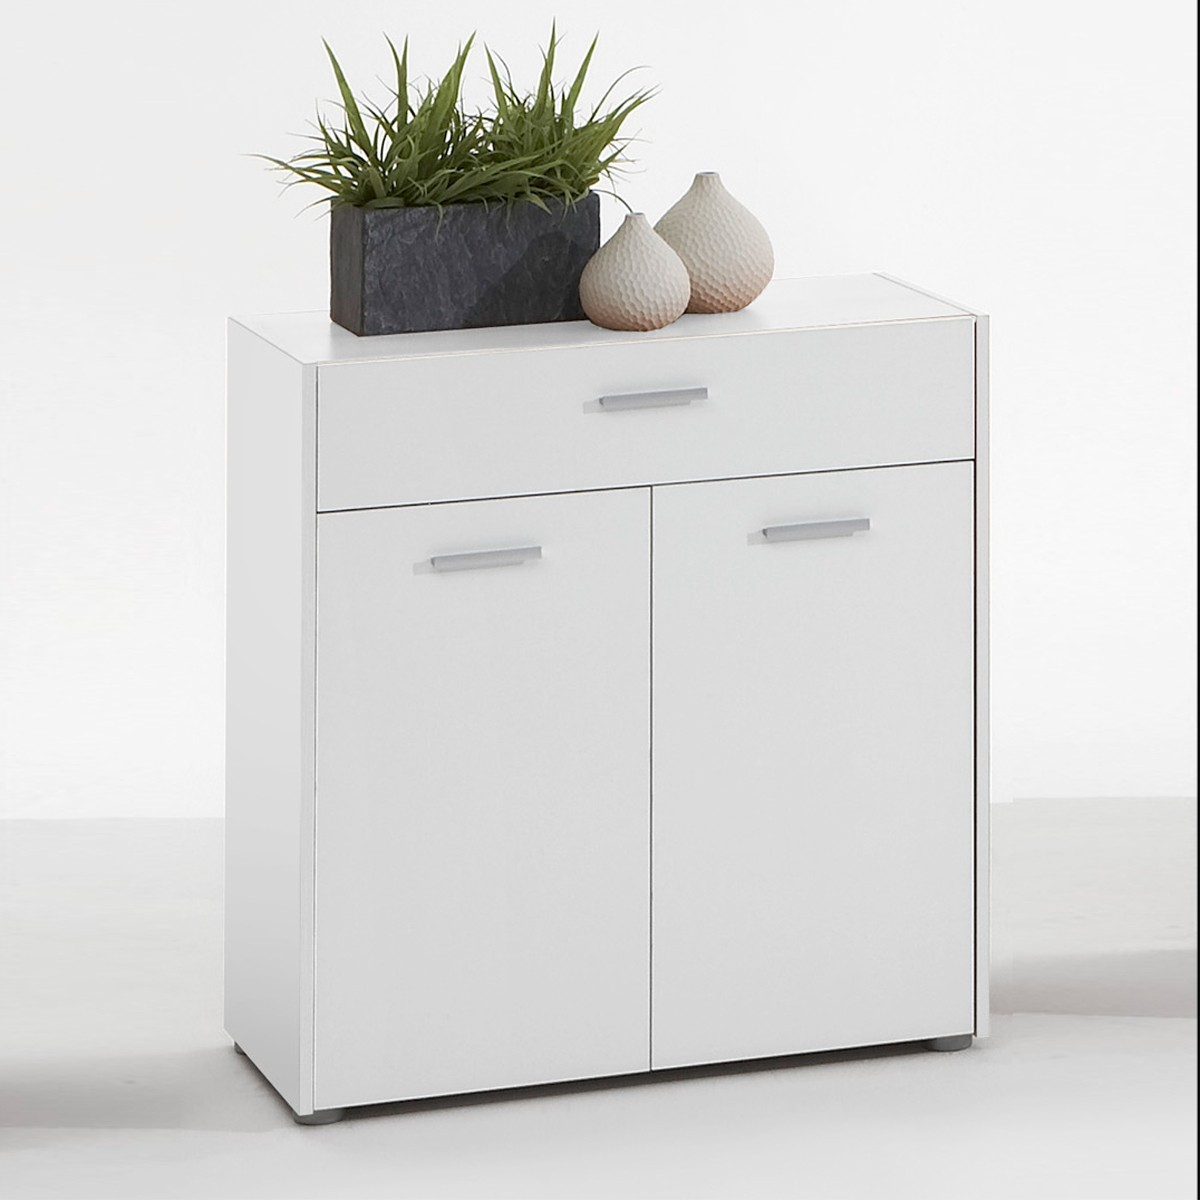 kommoden massivholz weis die neueste innovation der. Black Bedroom Furniture Sets. Home Design Ideas